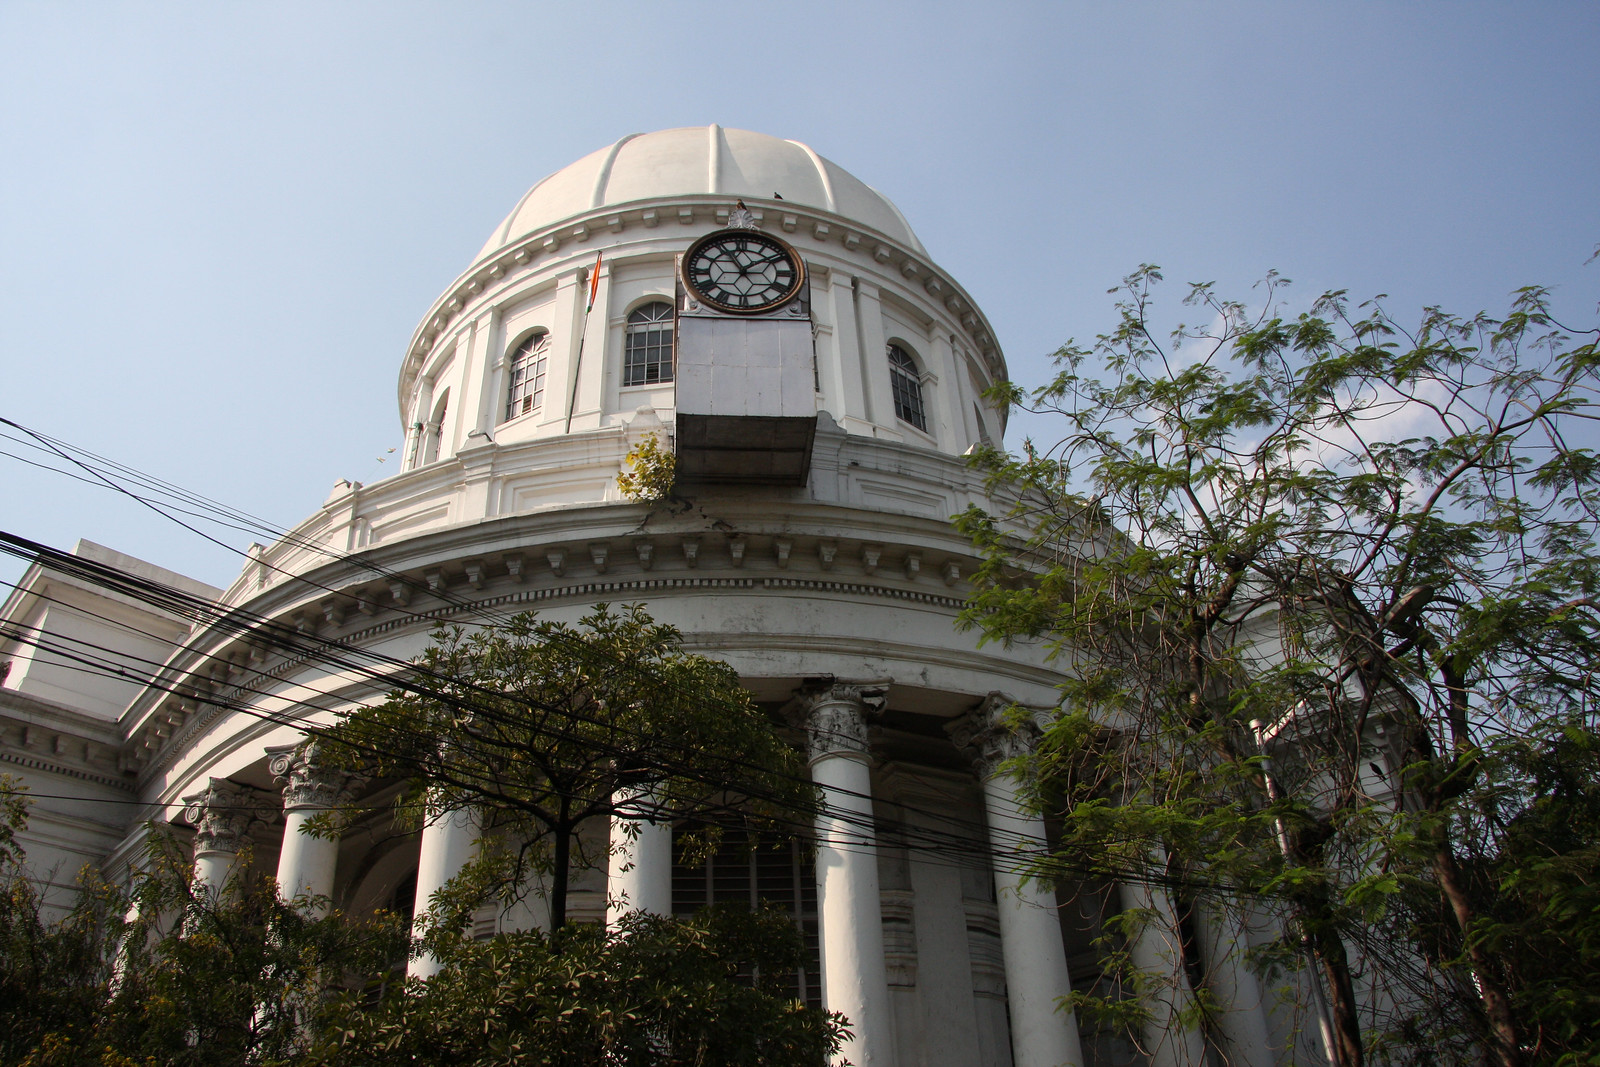 General post office, Kolkata, India 2013